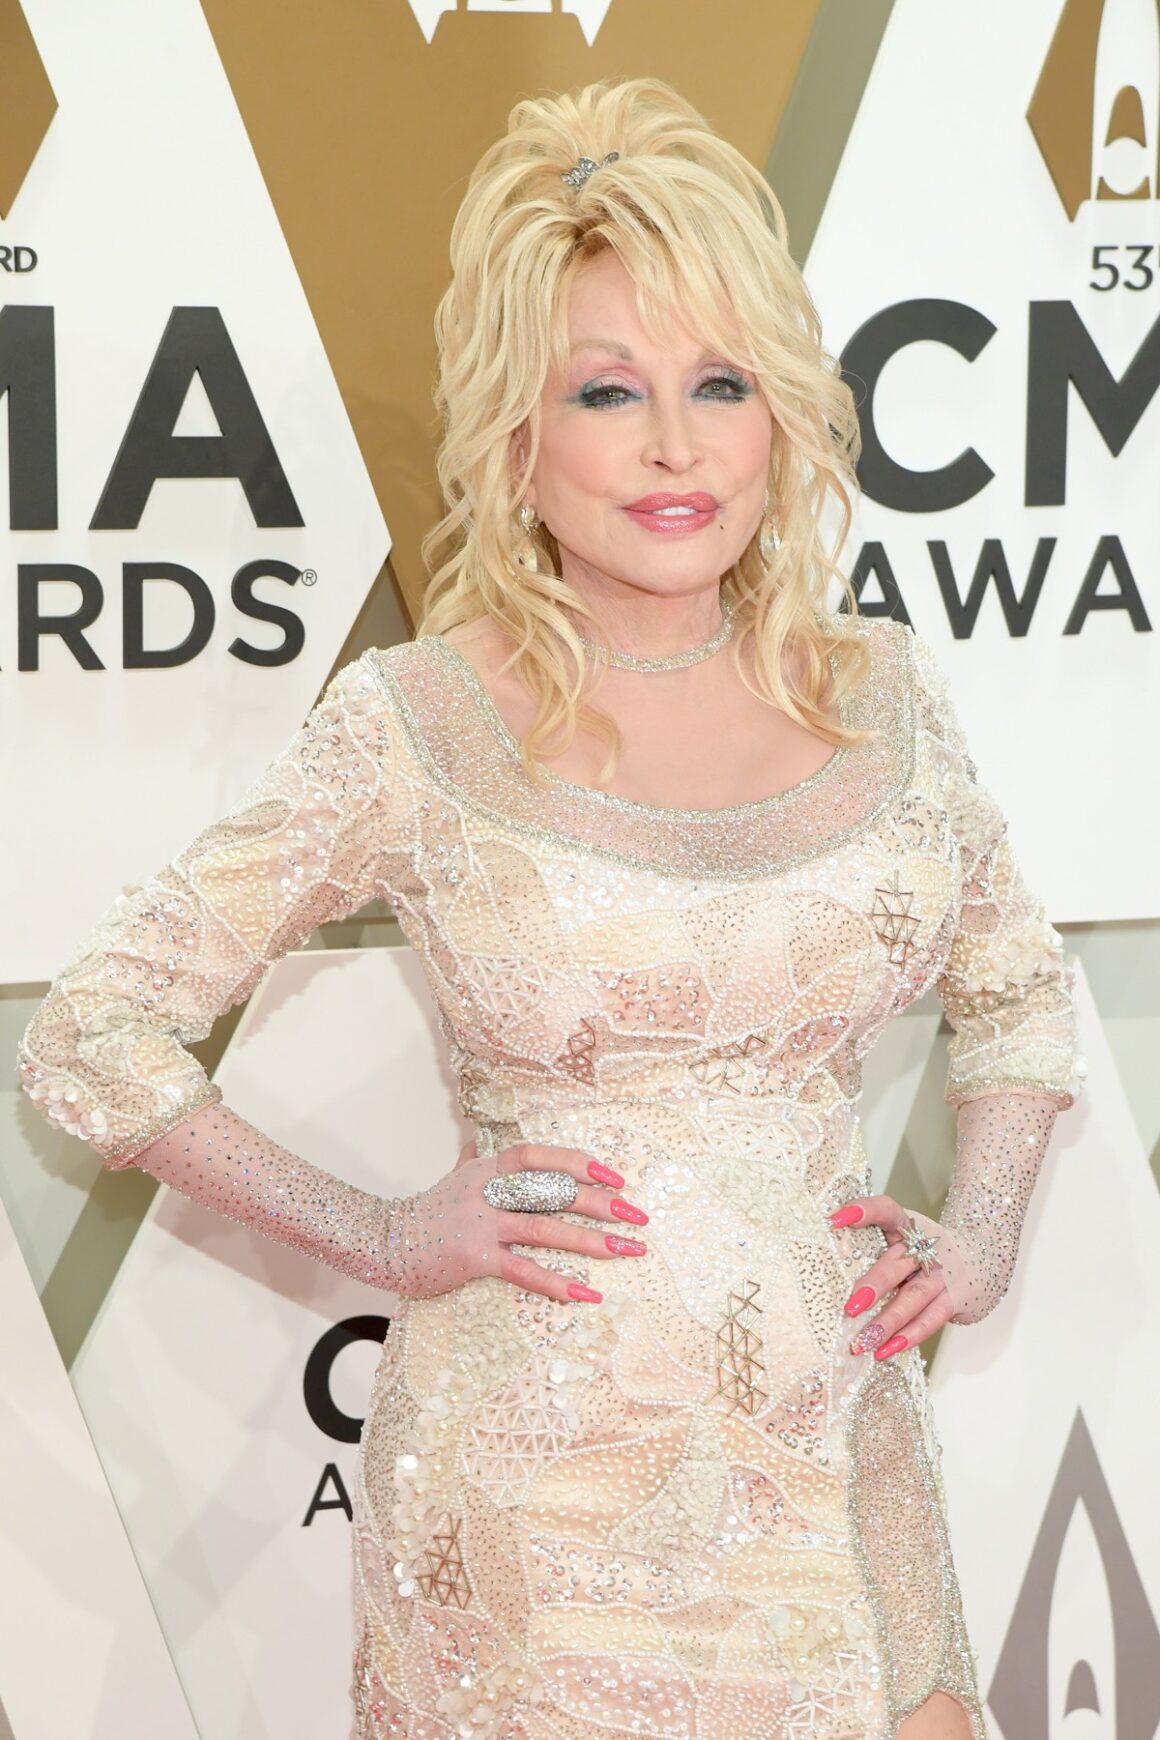 Dolly Parton The 53rd Annual CMA Awards - Arrivals